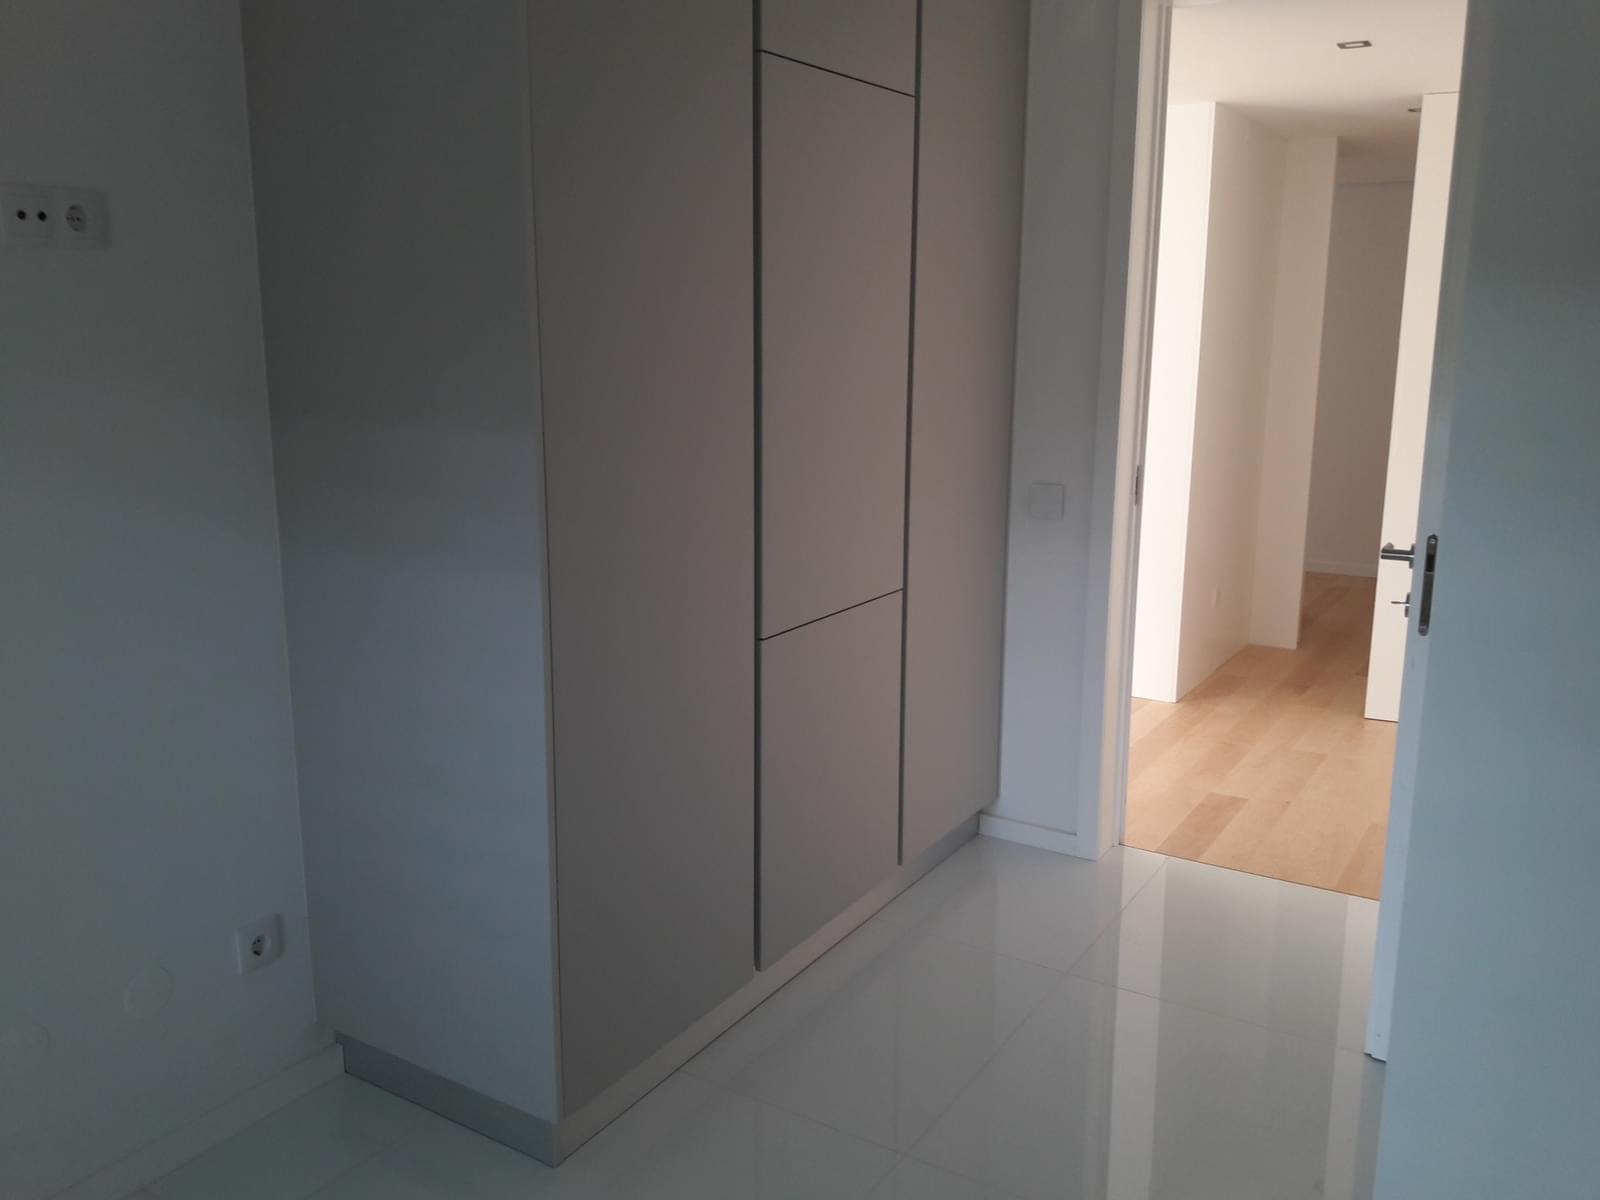 pf18284-apartamento-t2-cascais-5d0169a6-ba5e-4c33-b9f4-dc2cf424055e